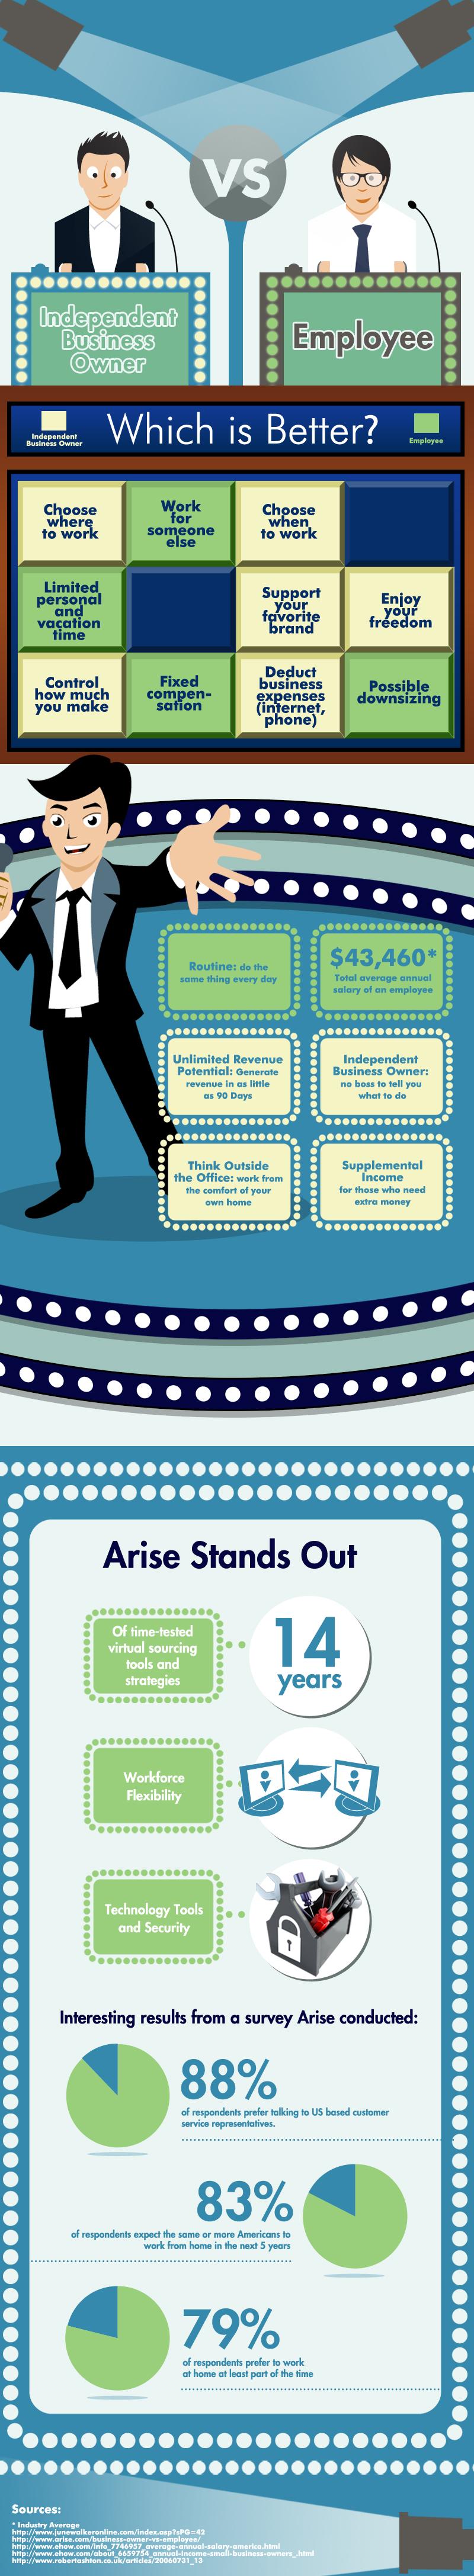 Independent Business Owner vs Employee Marketing program